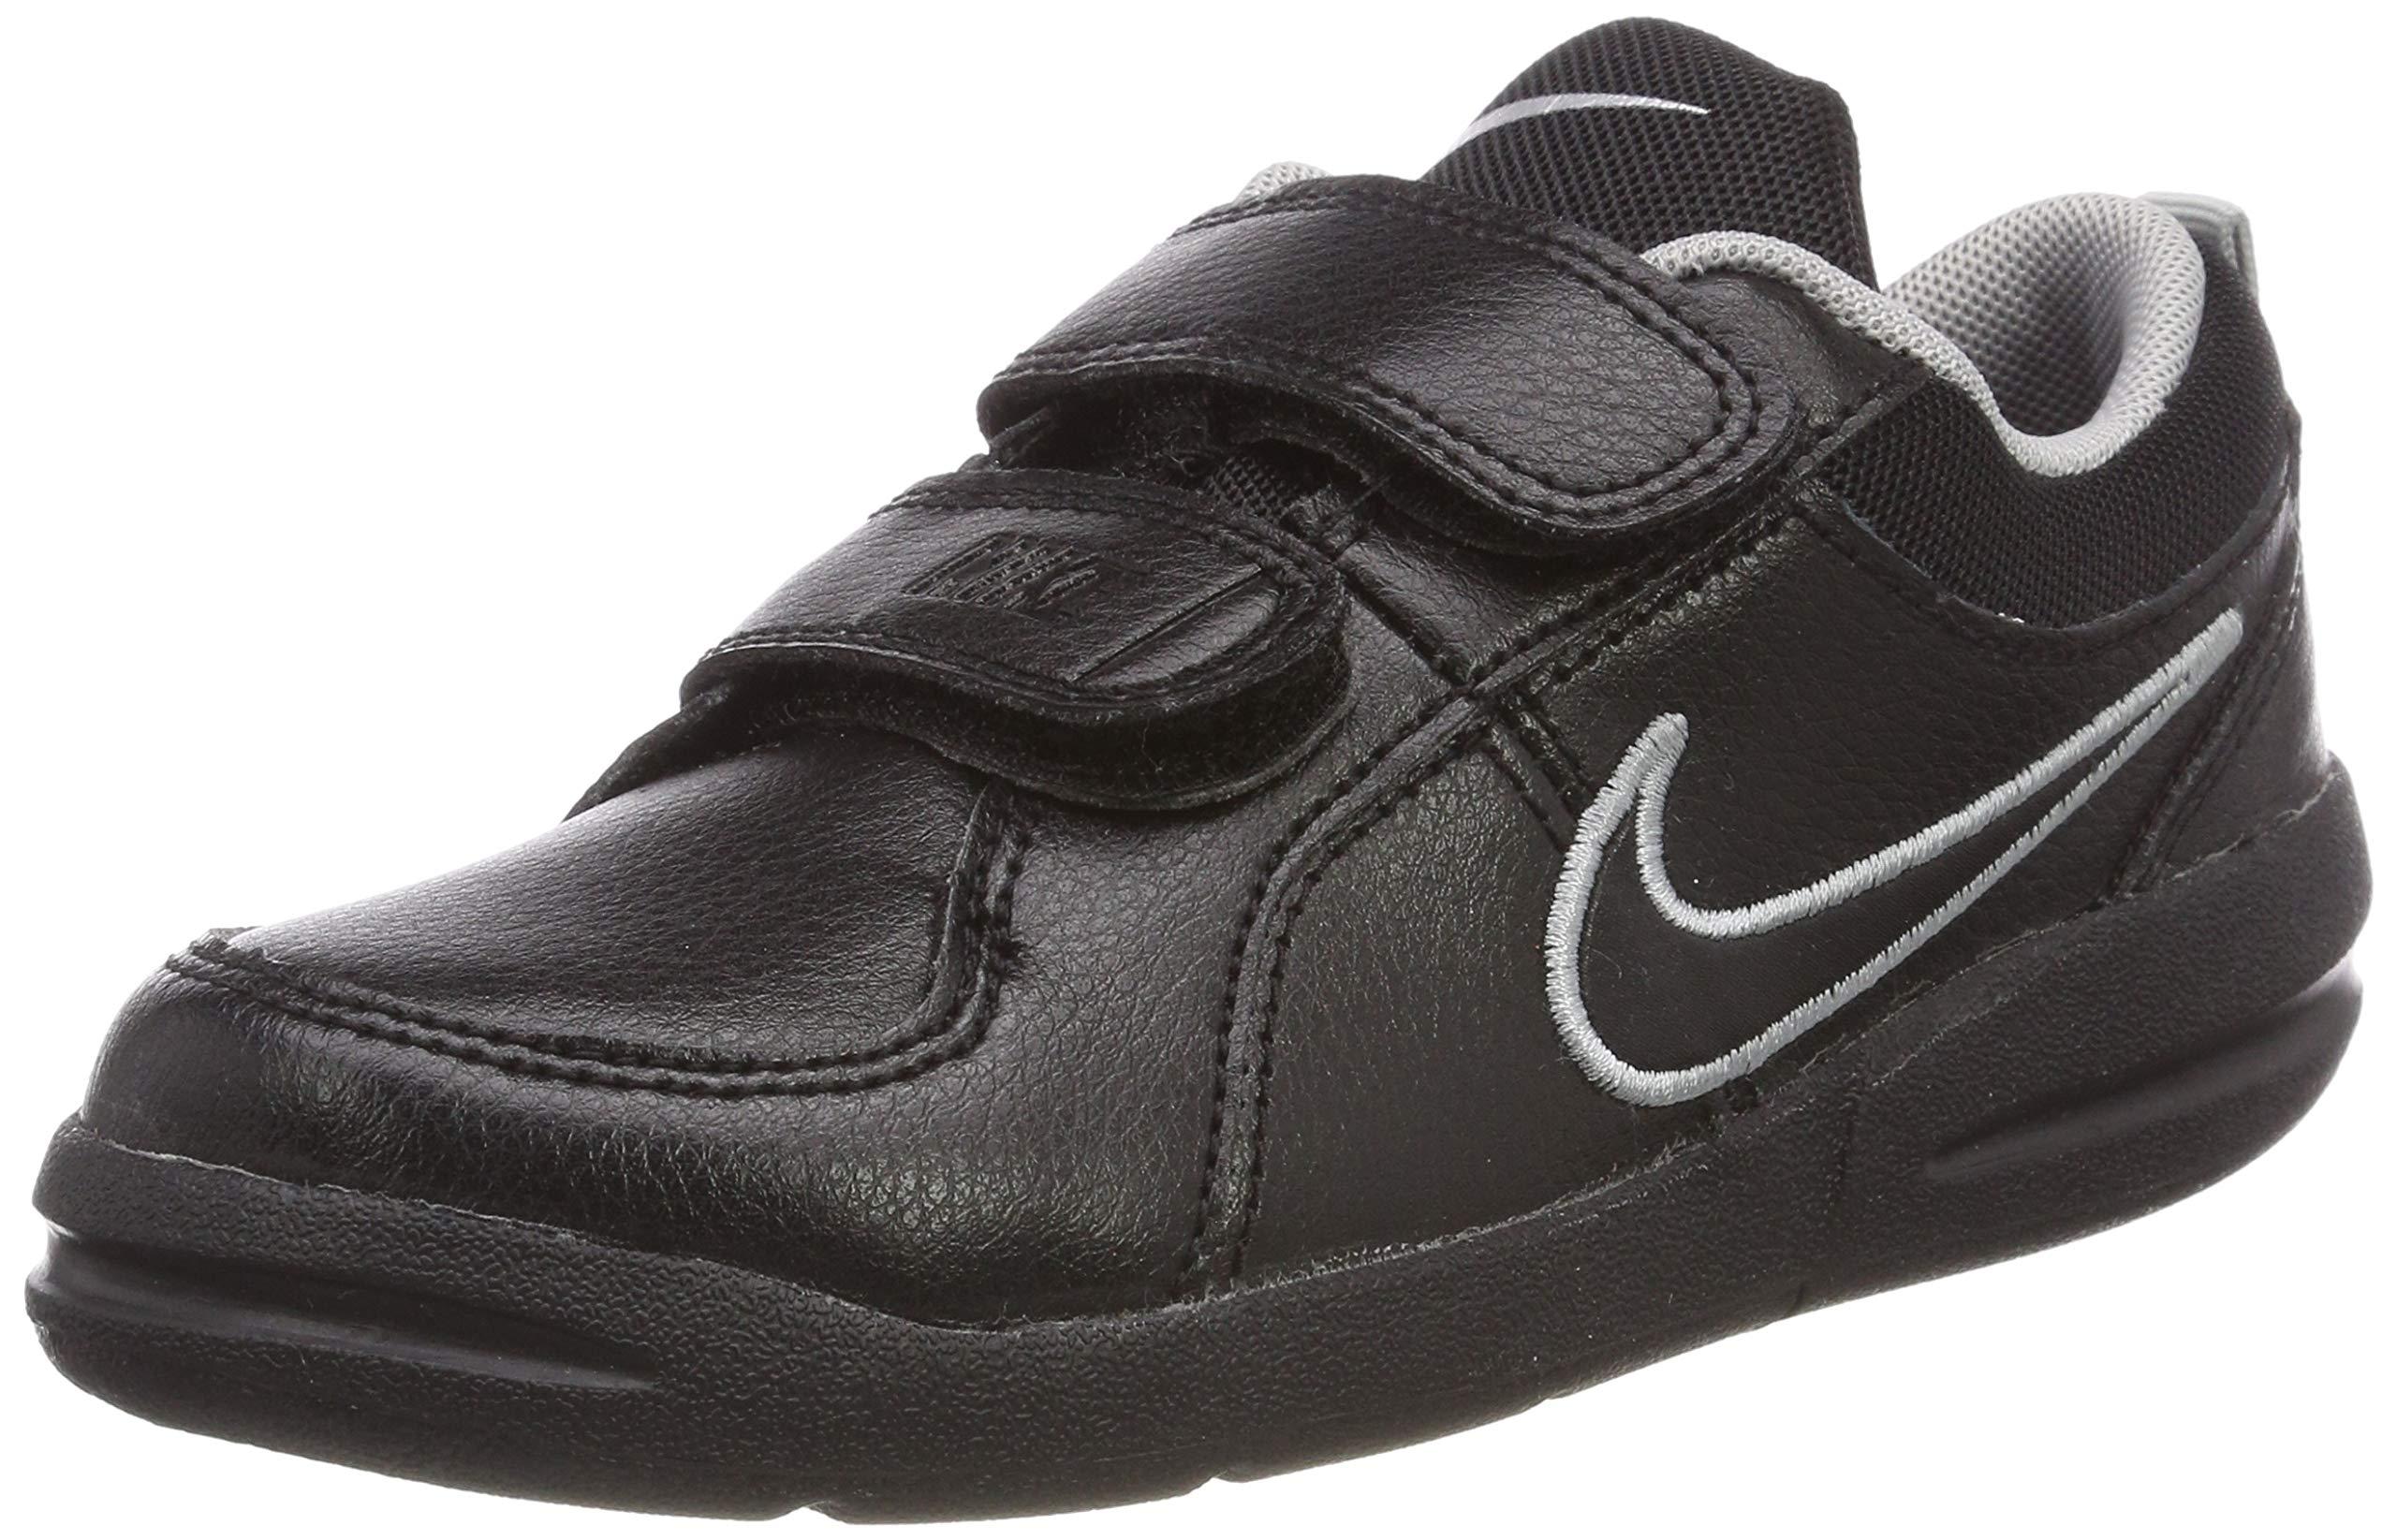 newest collection 501f3 b4001 Nike Pico 4 PSV, Chaussures de Tennis Mixte Enfant product image